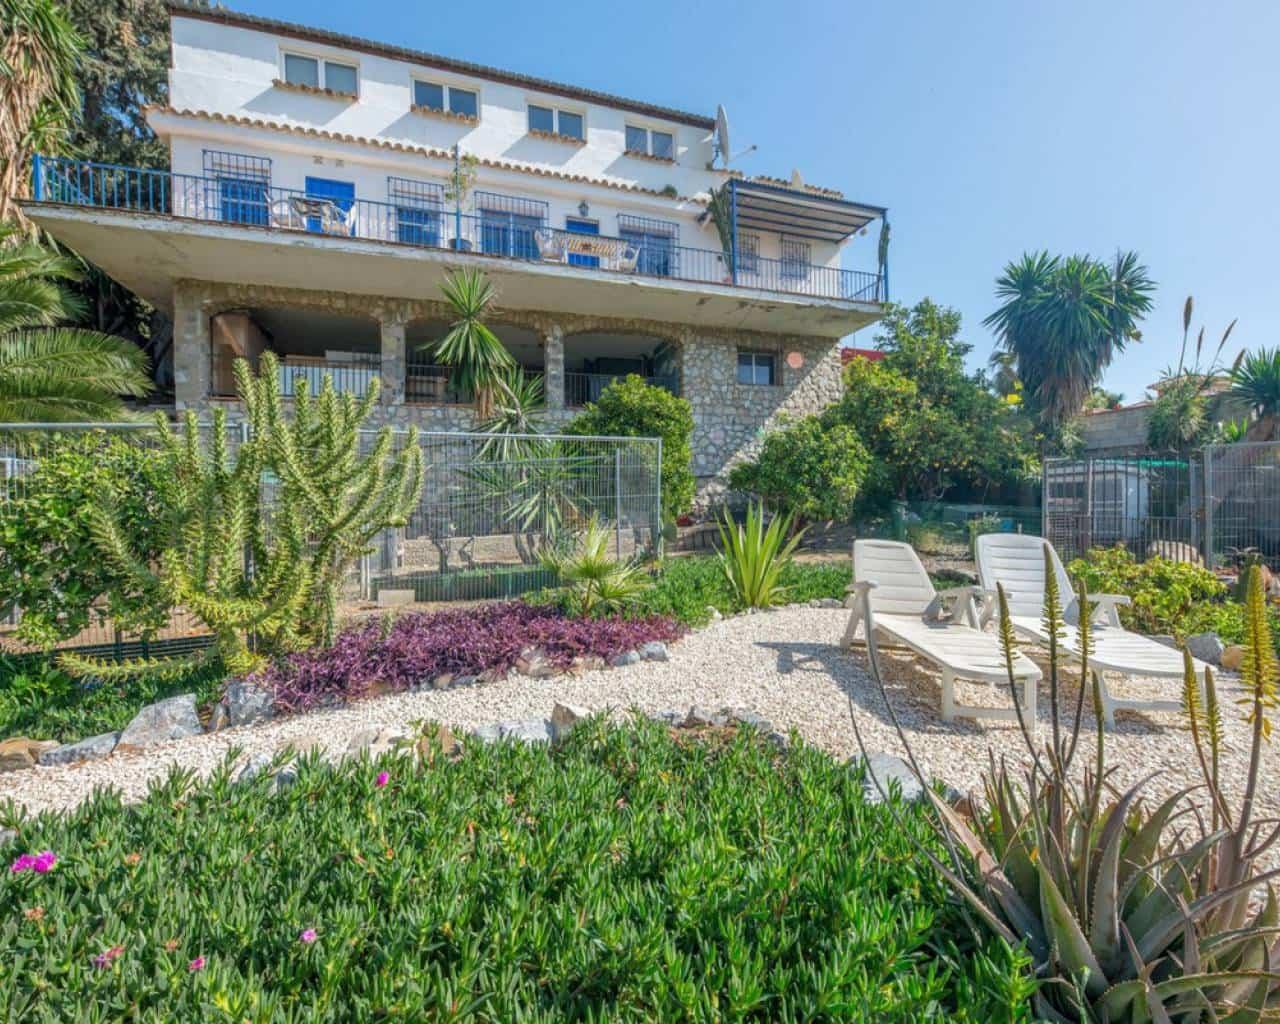 4 bedroom Villa for sale in Torremolinos with pool - € 449,000 (Ref: 4966810)